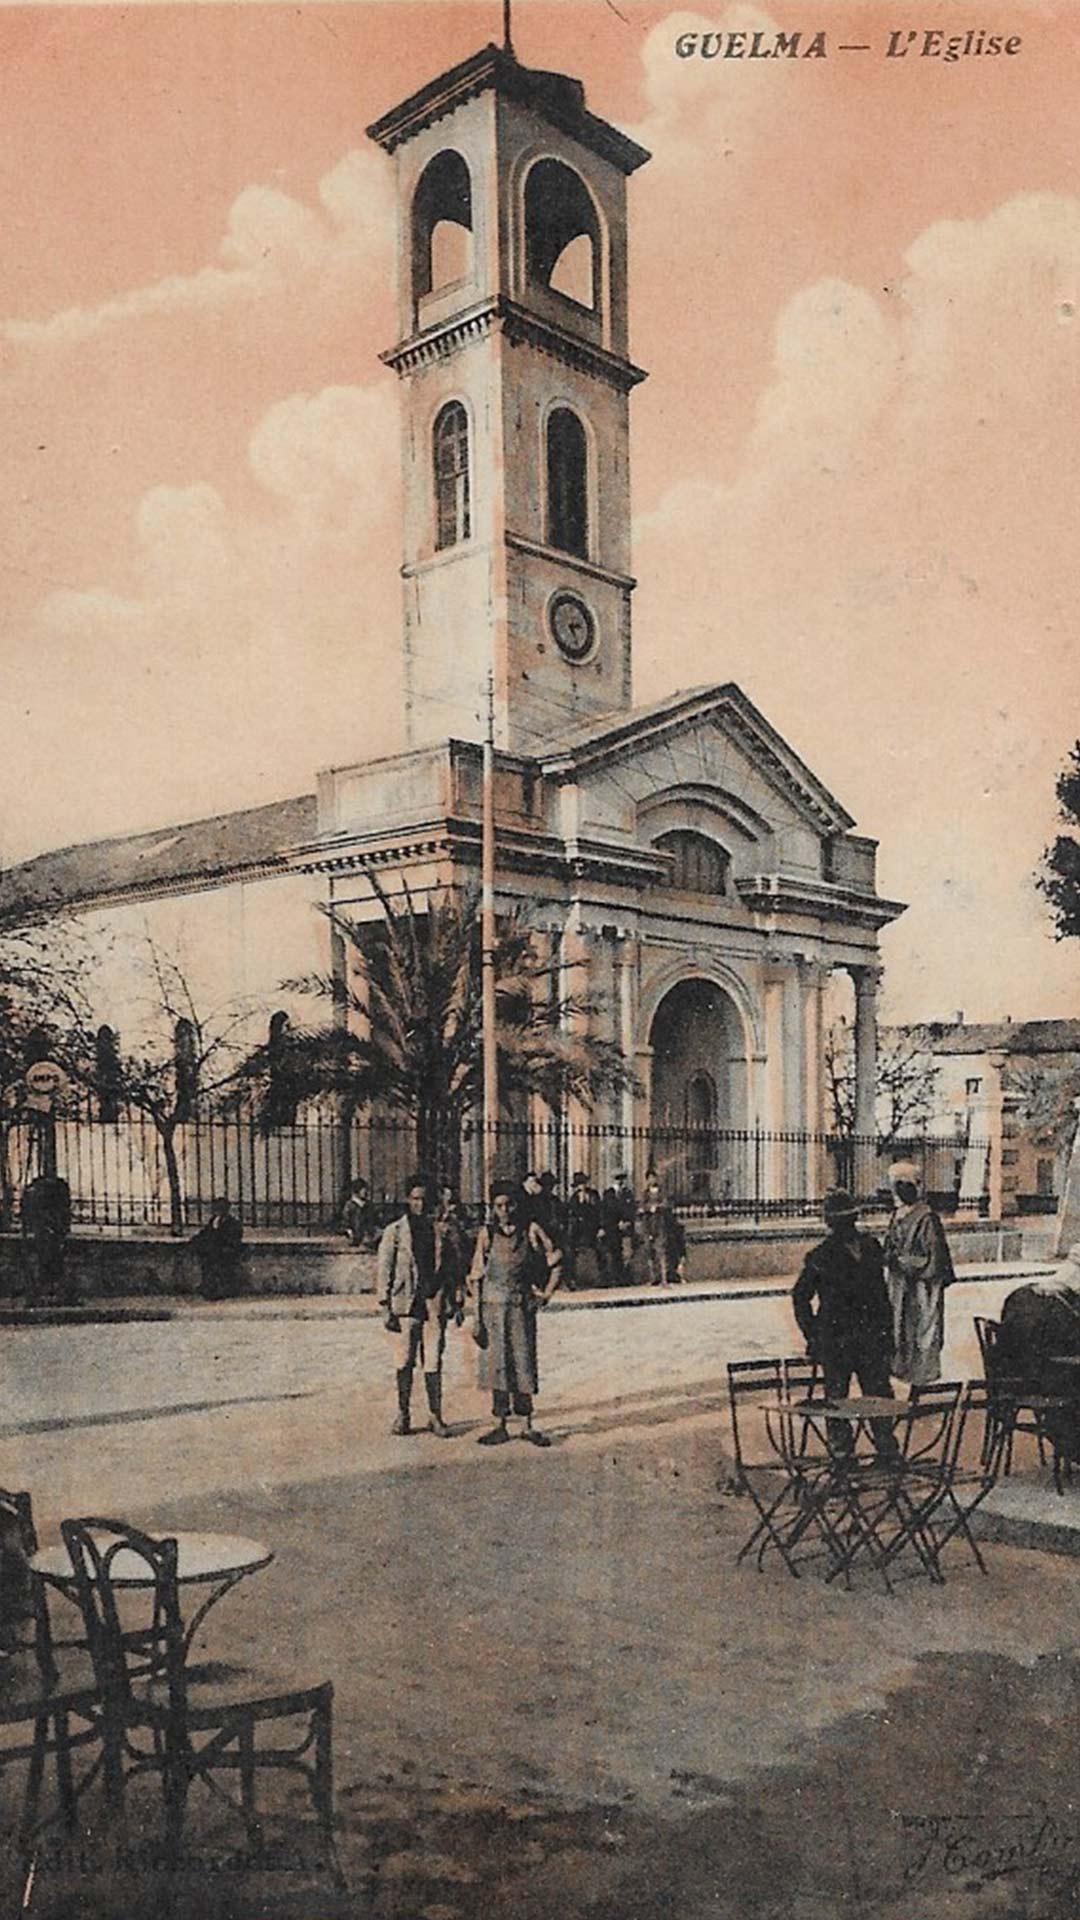 Guelma-Eglise